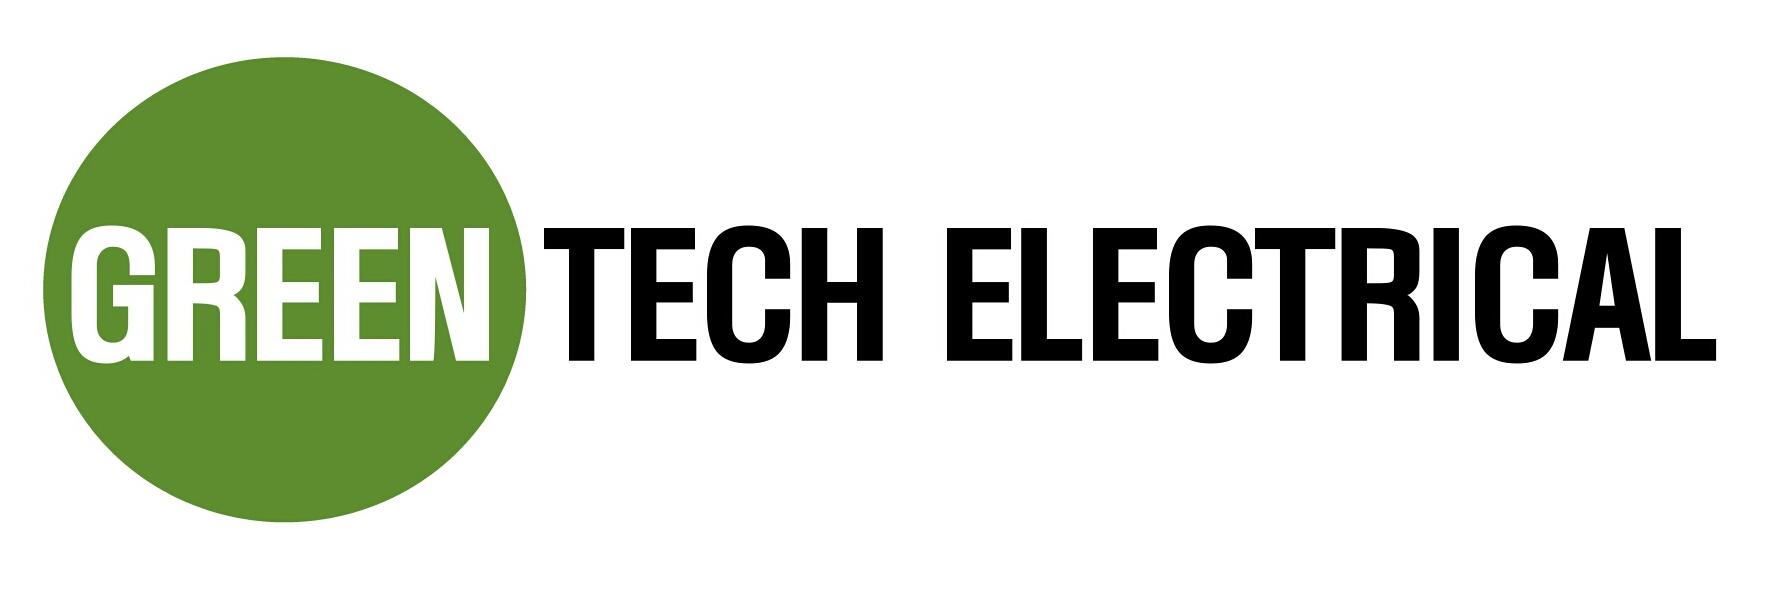 Green Tech Electrical